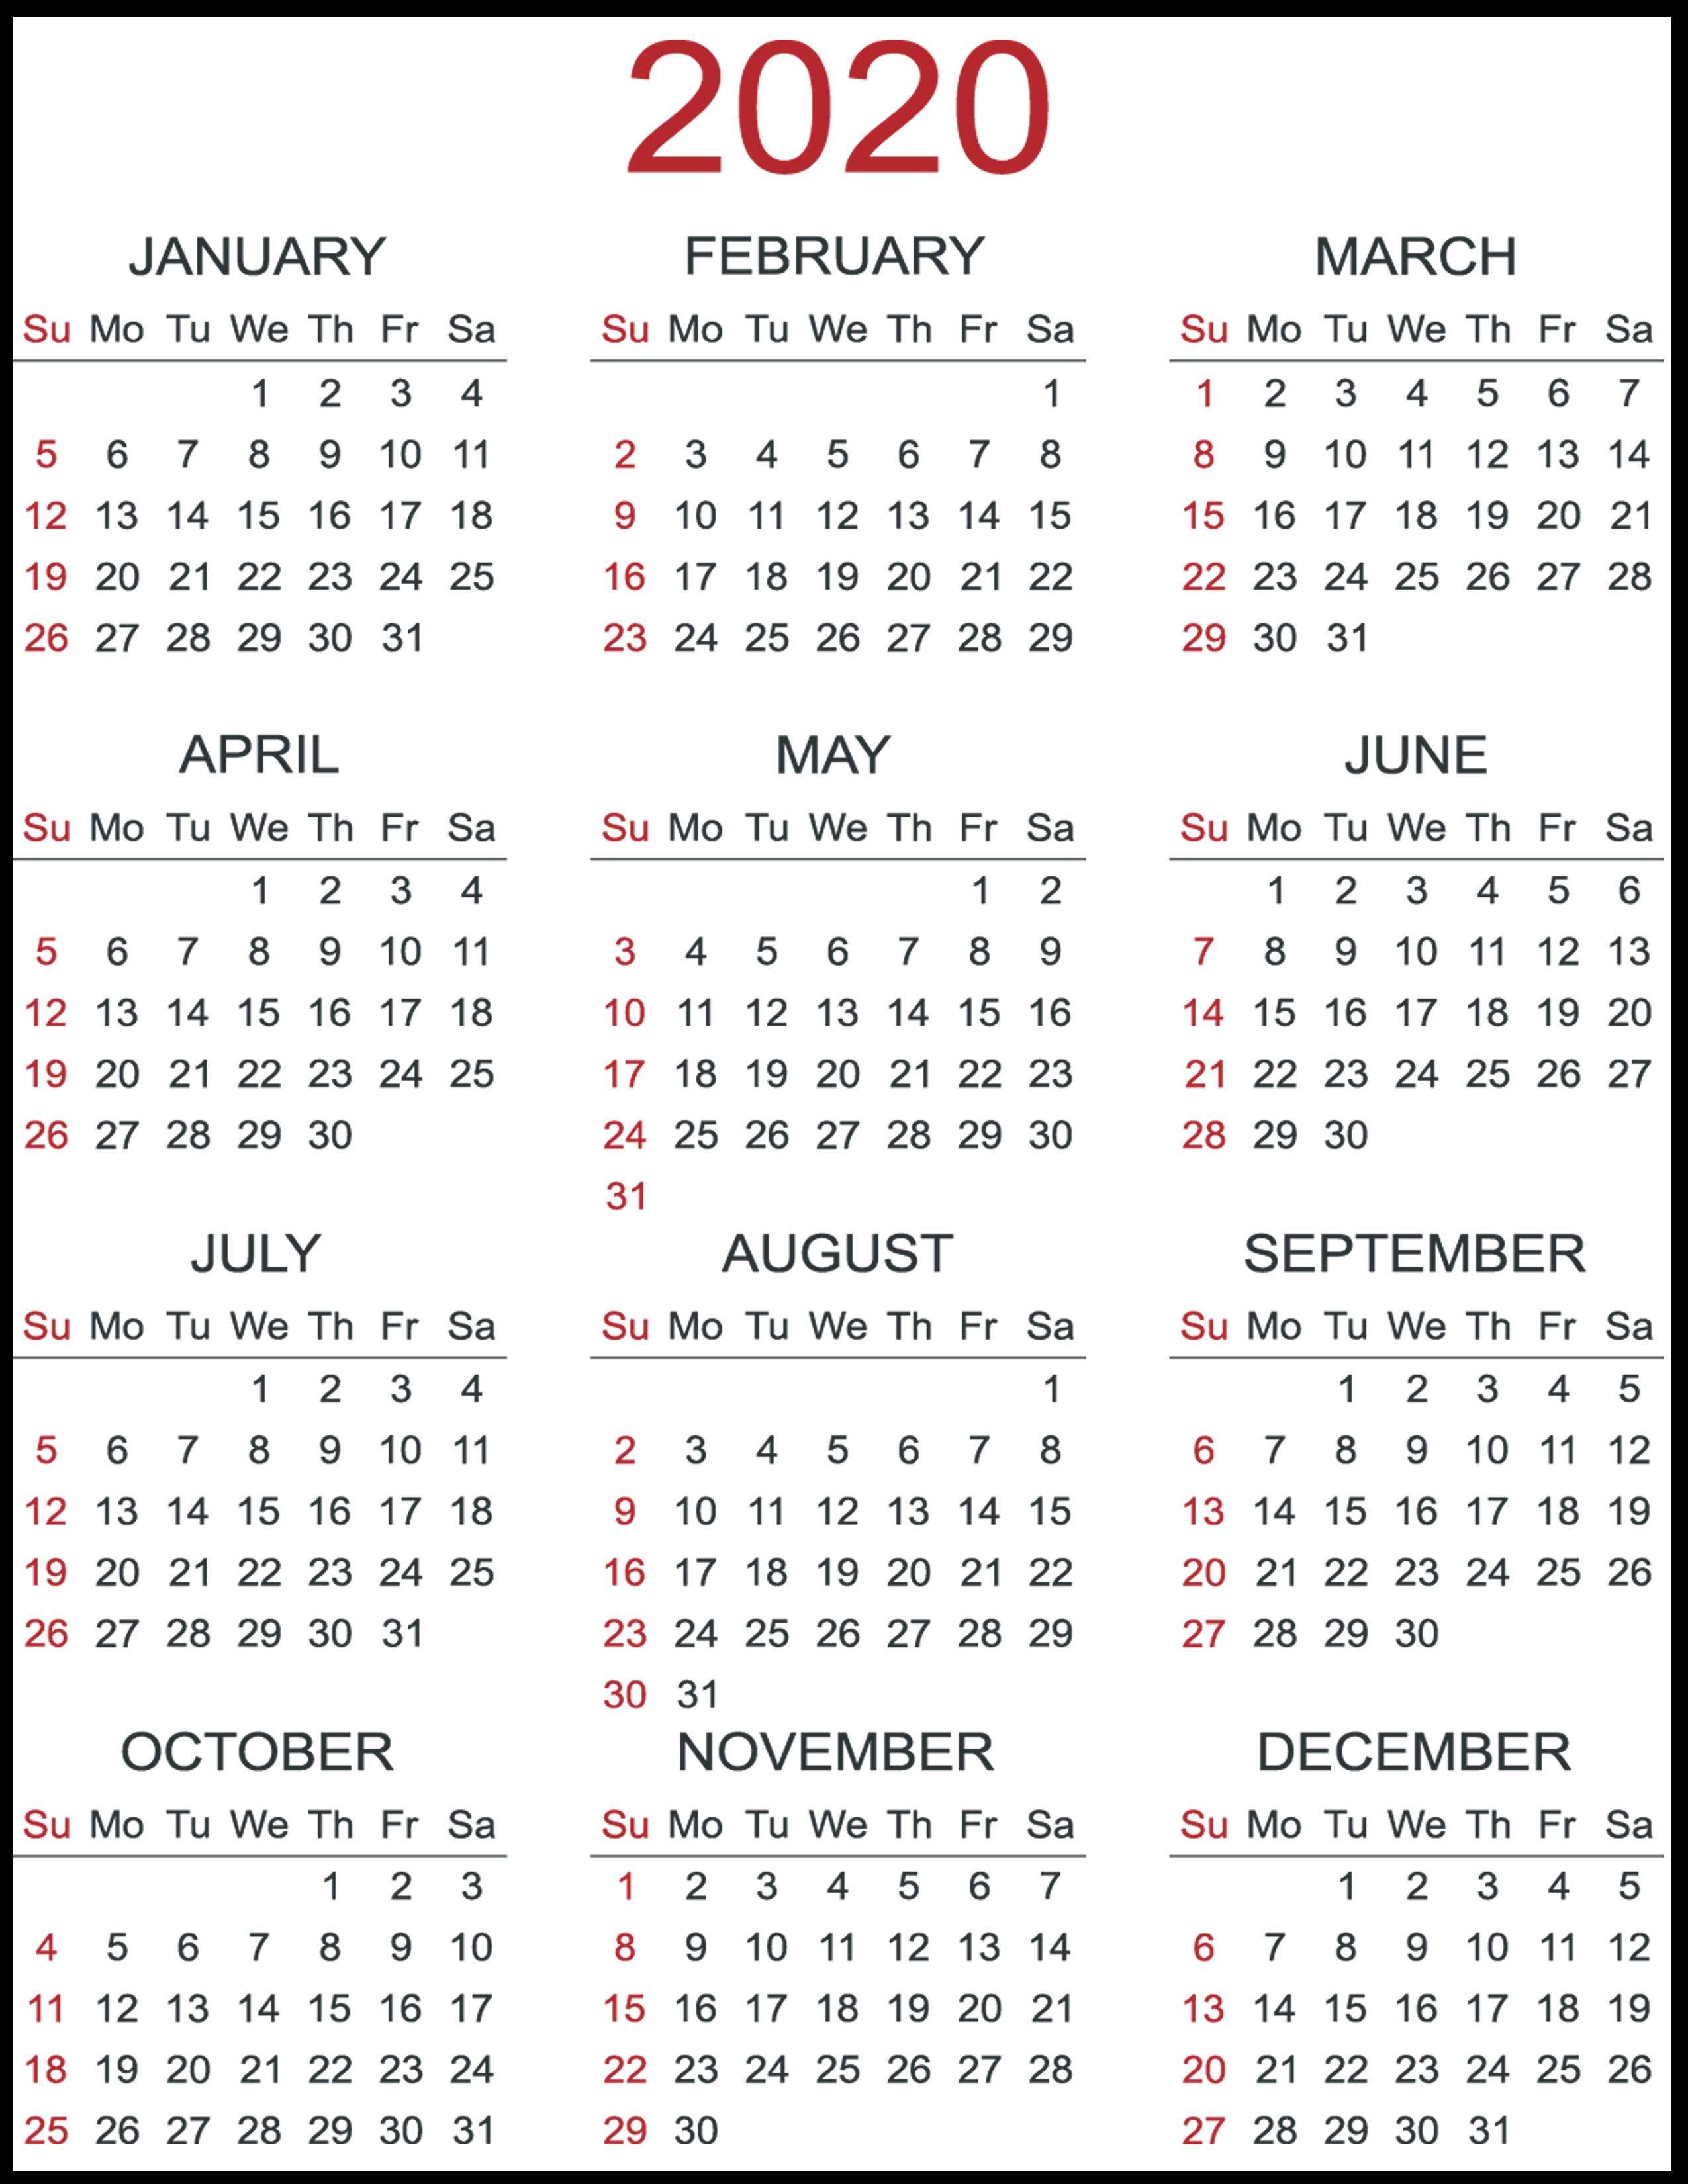 Blank Calendar 2020 Pdf - Wpa.wpart.co with regard to I-9 Form 2020 Pdf